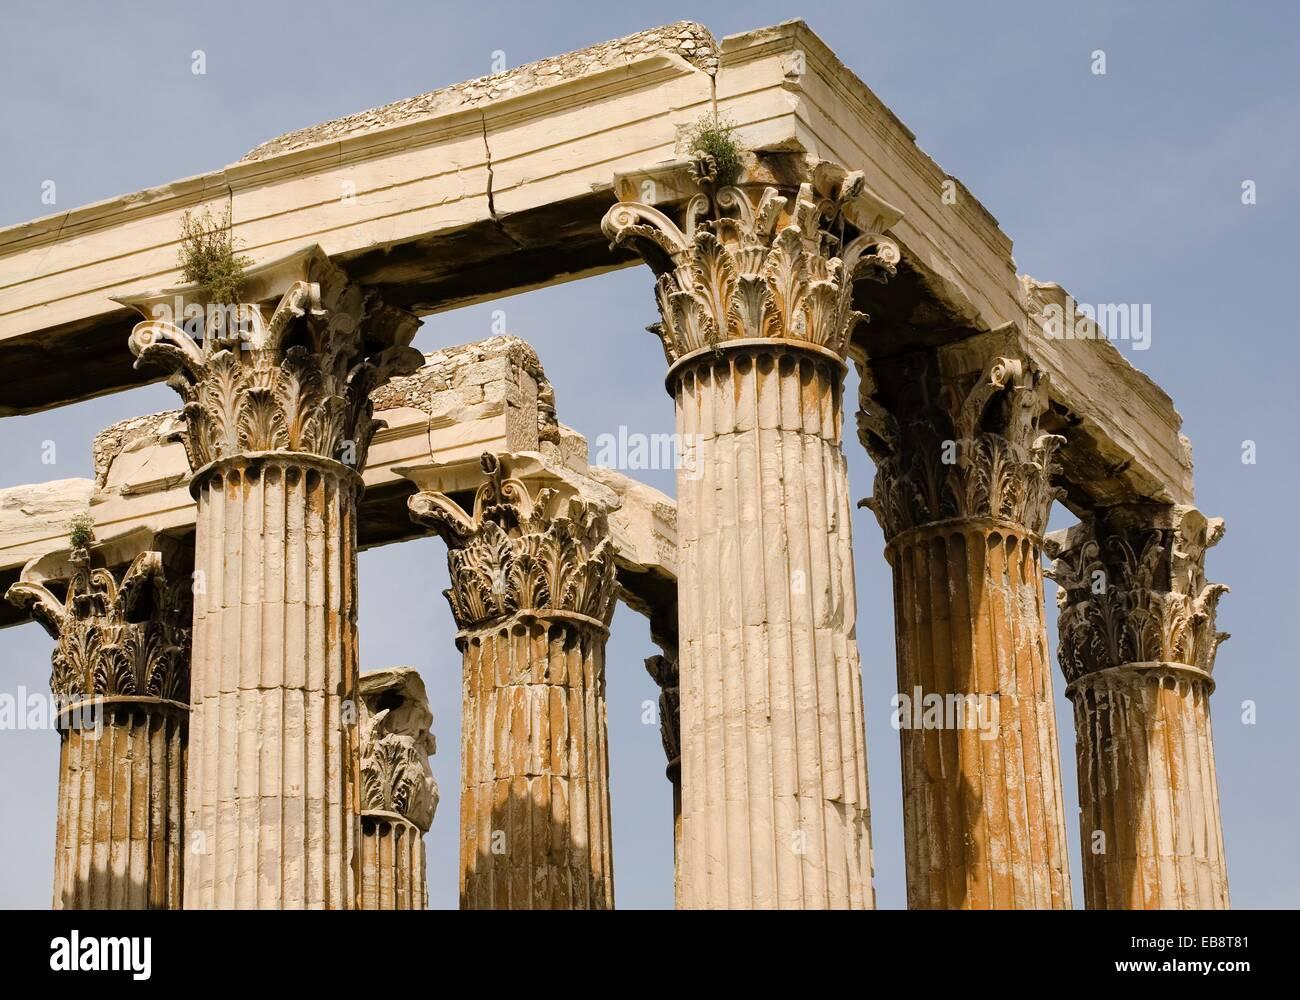 Temple Of Olympian Zeus Corinthian Columns And Capitels